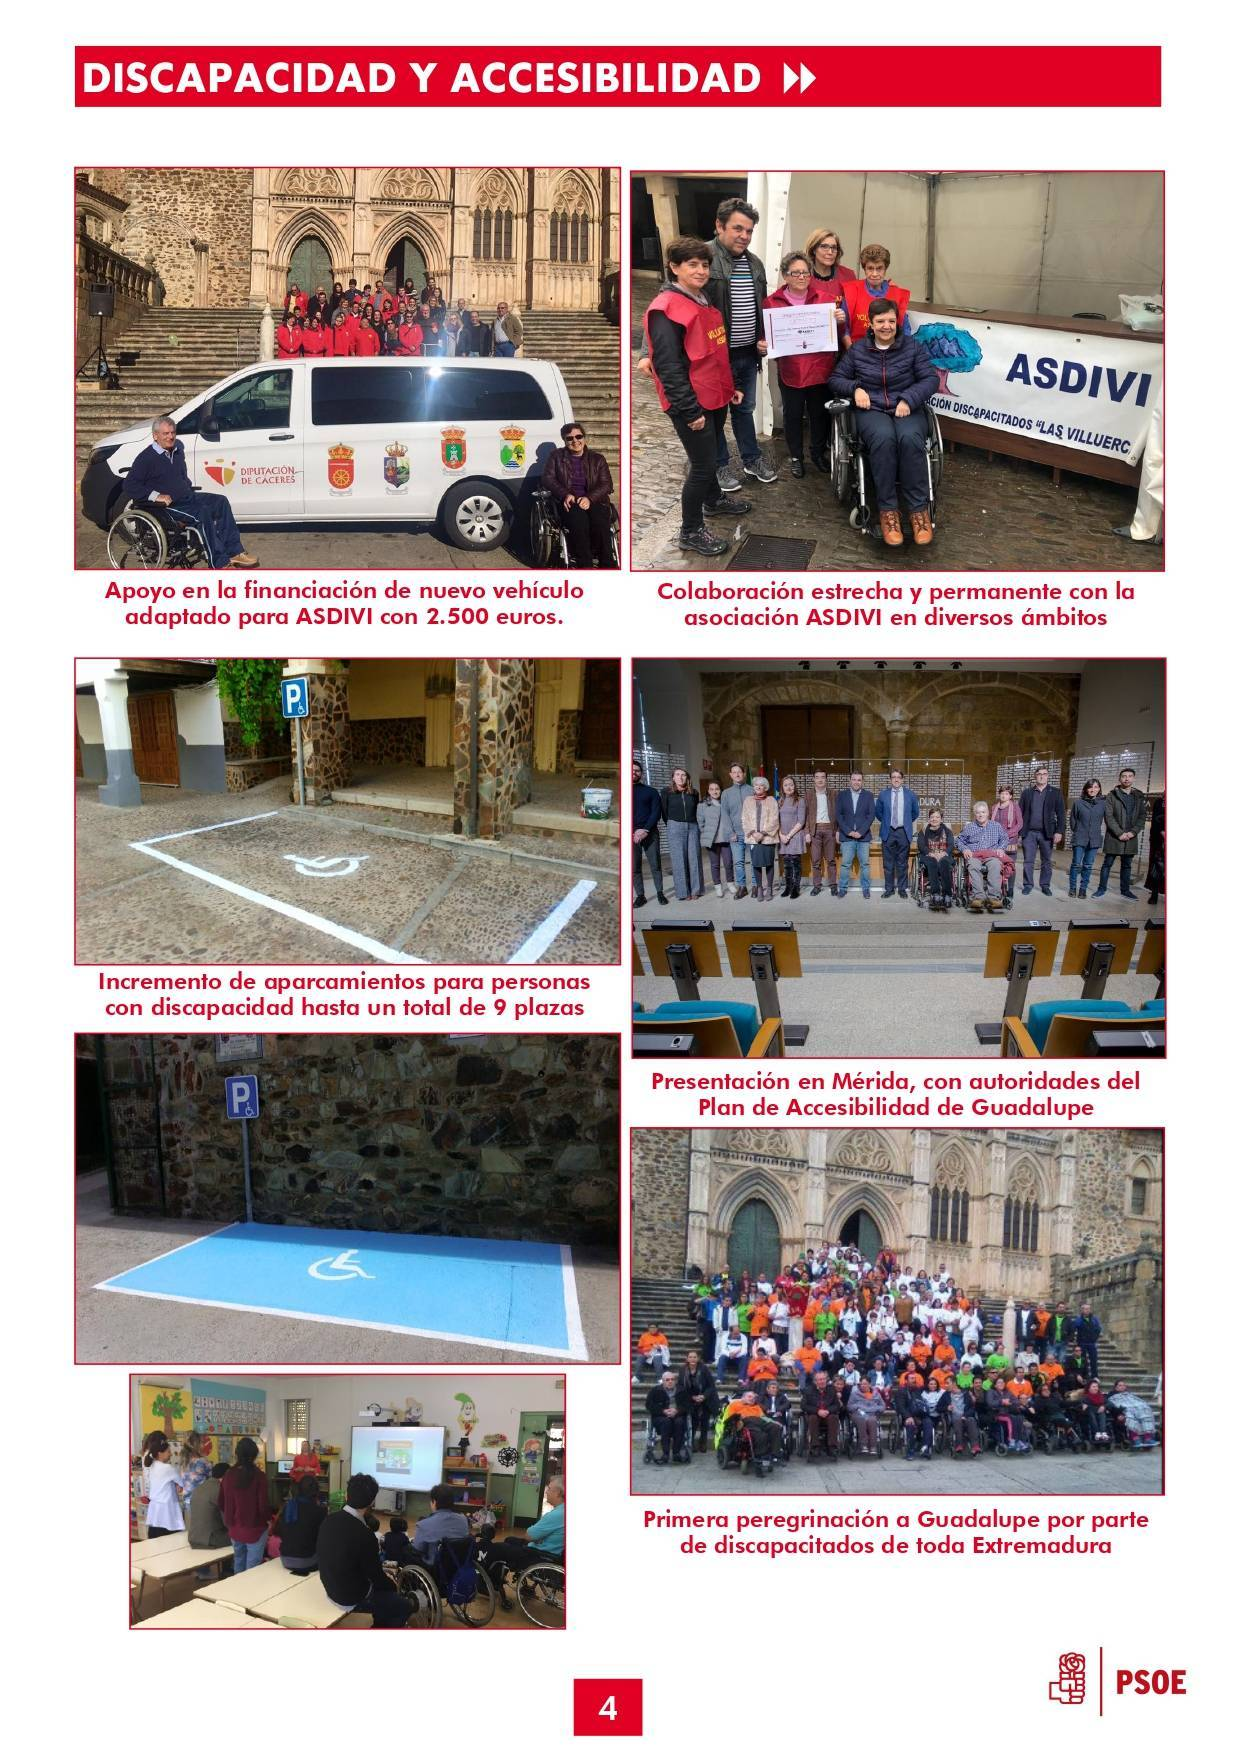 Boletín informativo de gestión municipal 2015-2019 - Guadalupe (Cáceres) 4